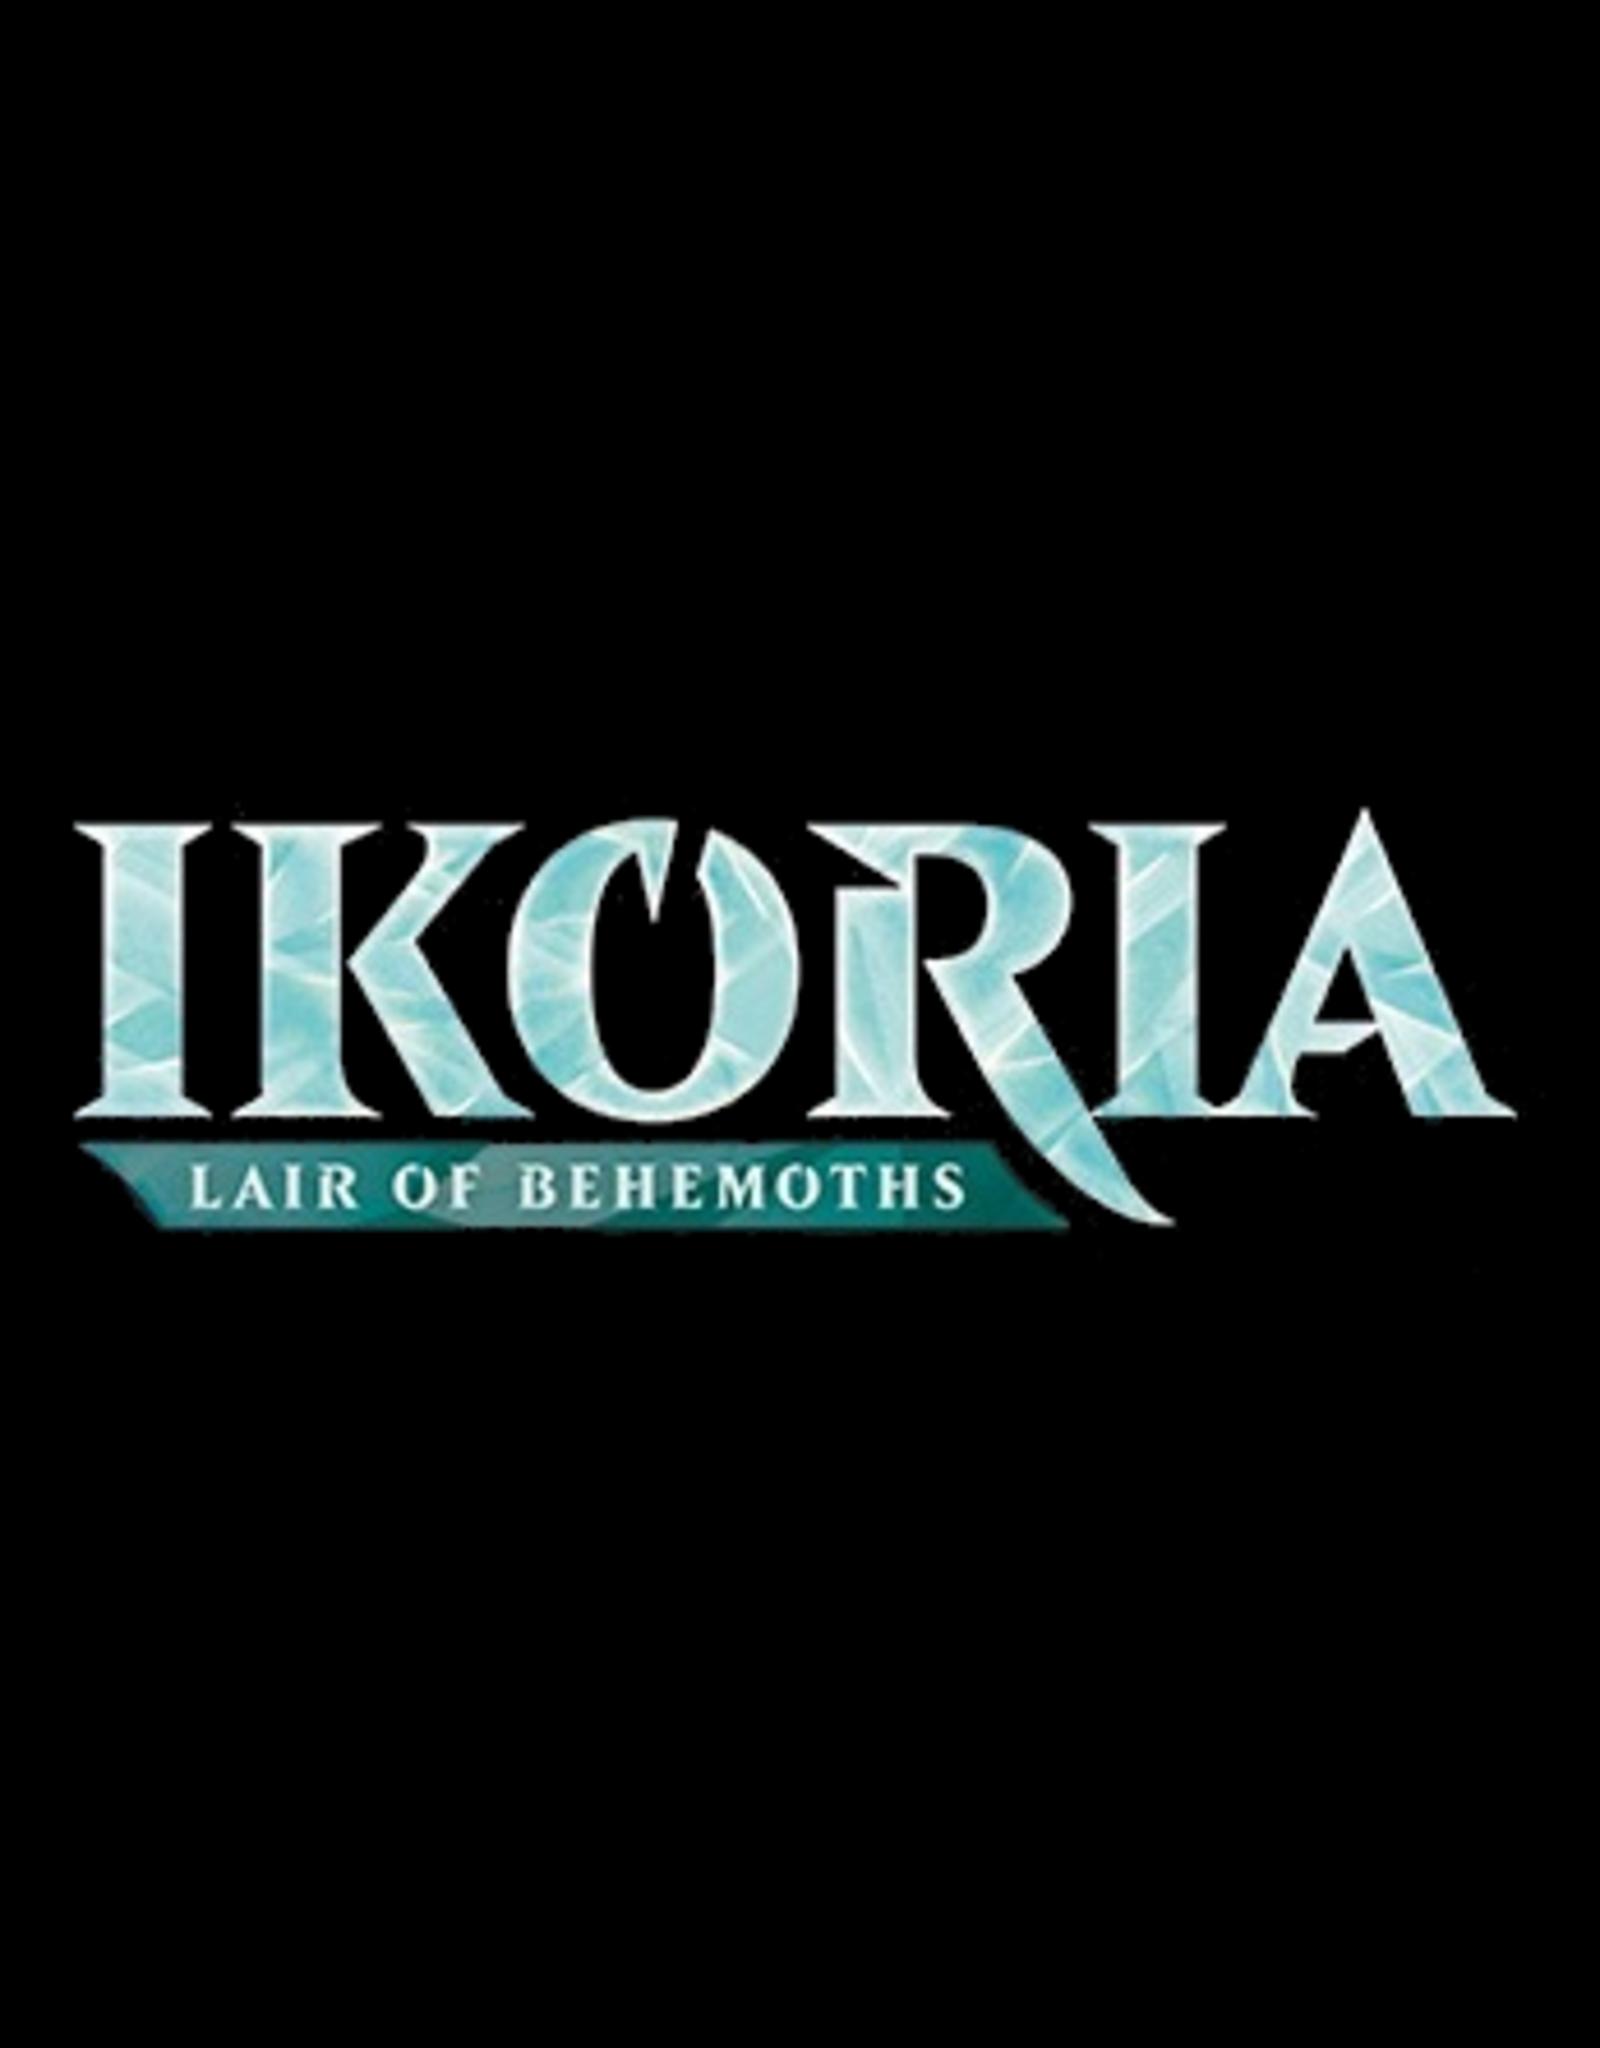 Magic: The Gathering Ikoria: Lair of Behemoths - Regular Full Set